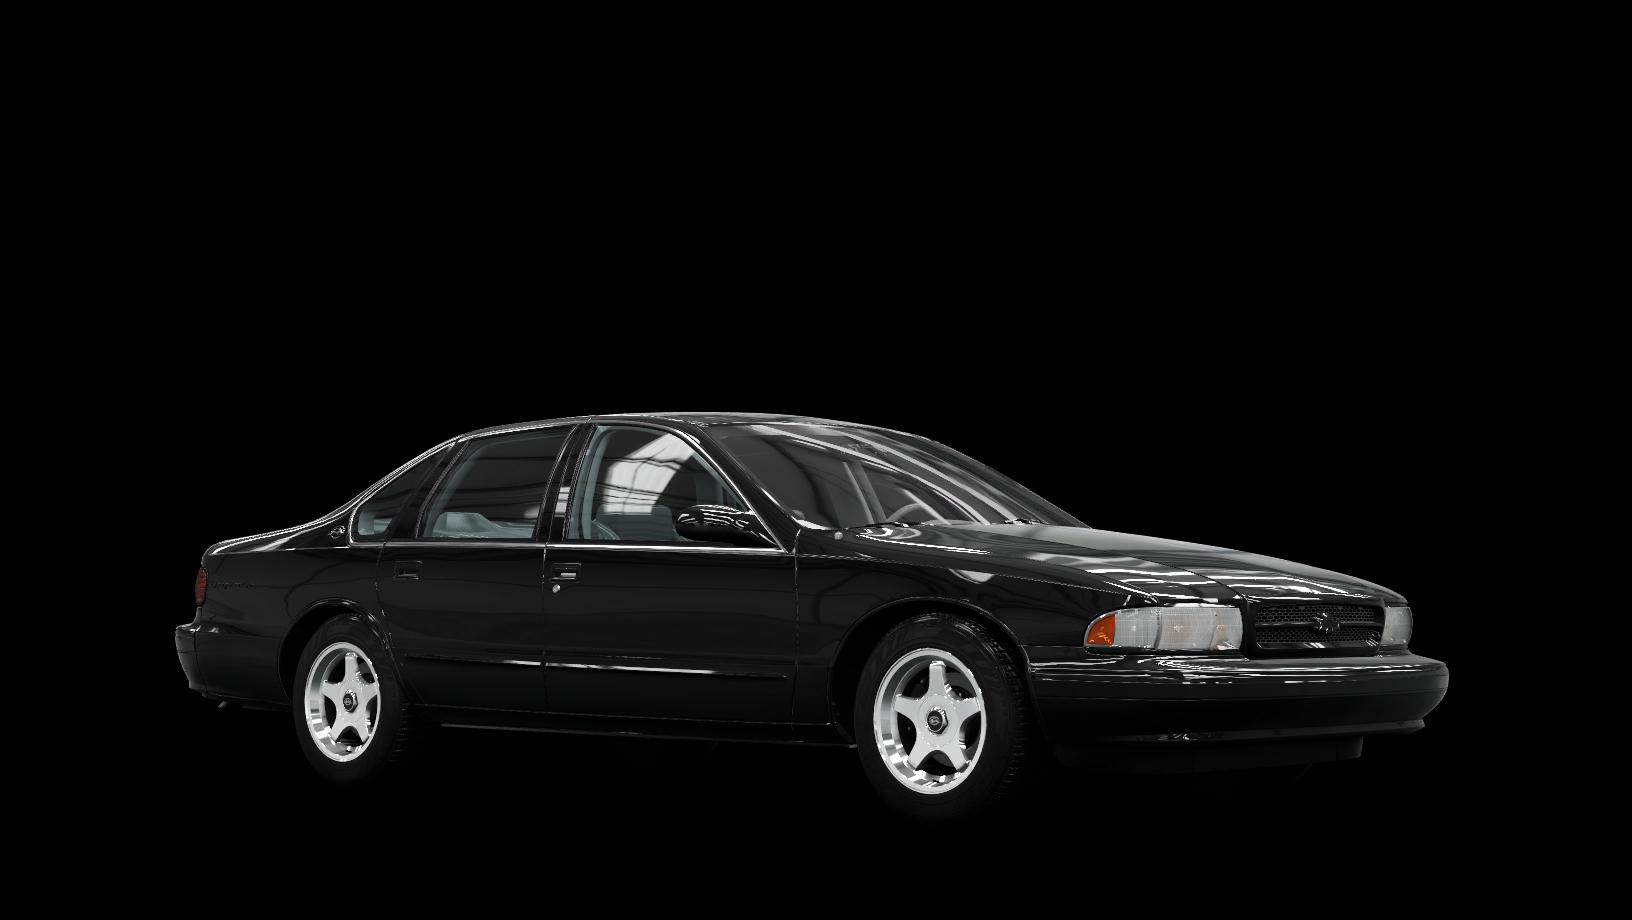 Chevrolet Impala Super Sport Forza Wiki Fandom